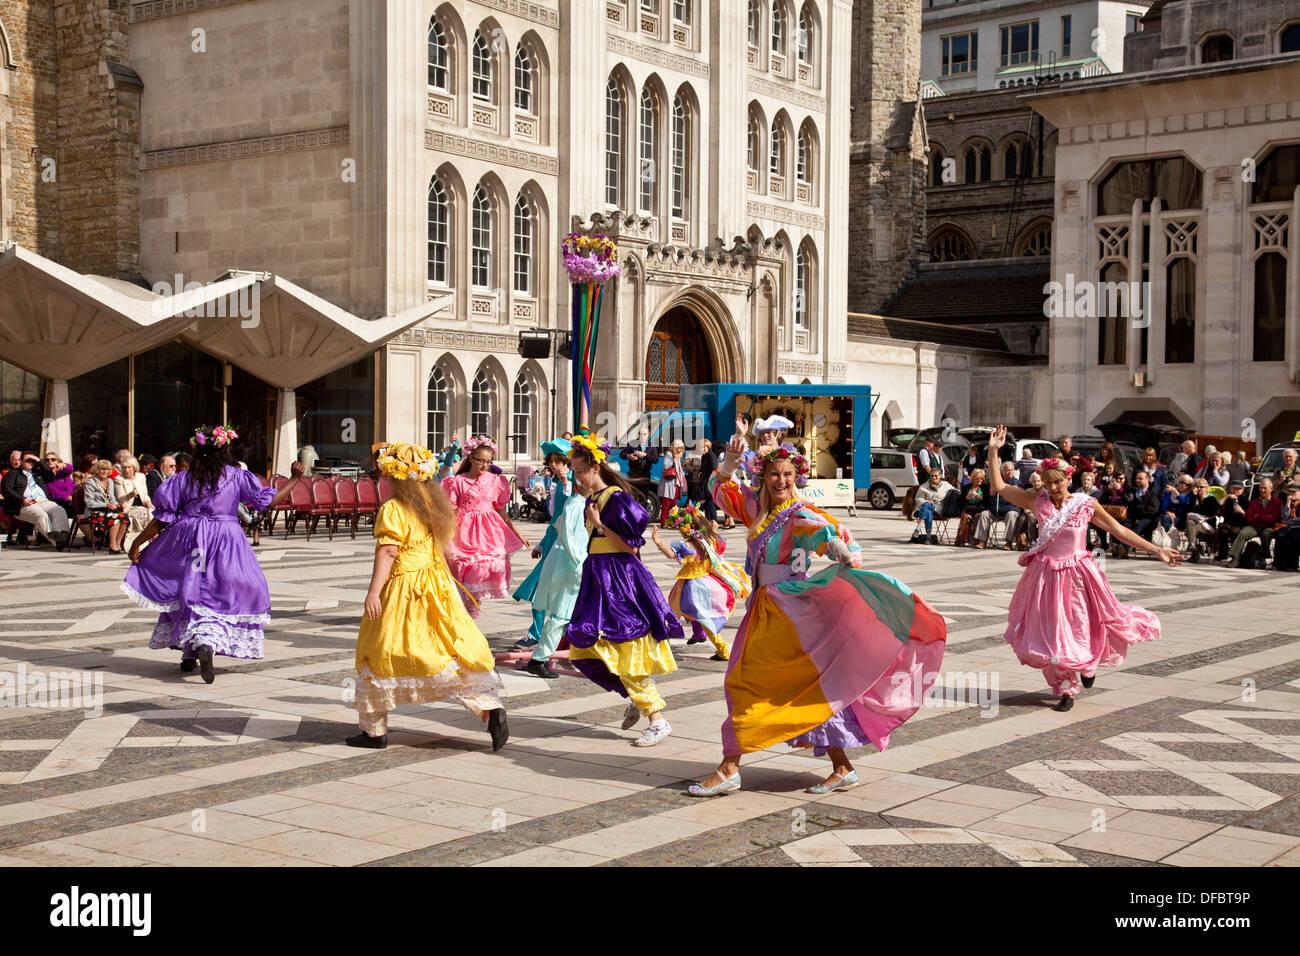 Maibaum-Tänzer, Pearly Kings und Queens Gesellschaft Harvest Festival, London, England Stockbild